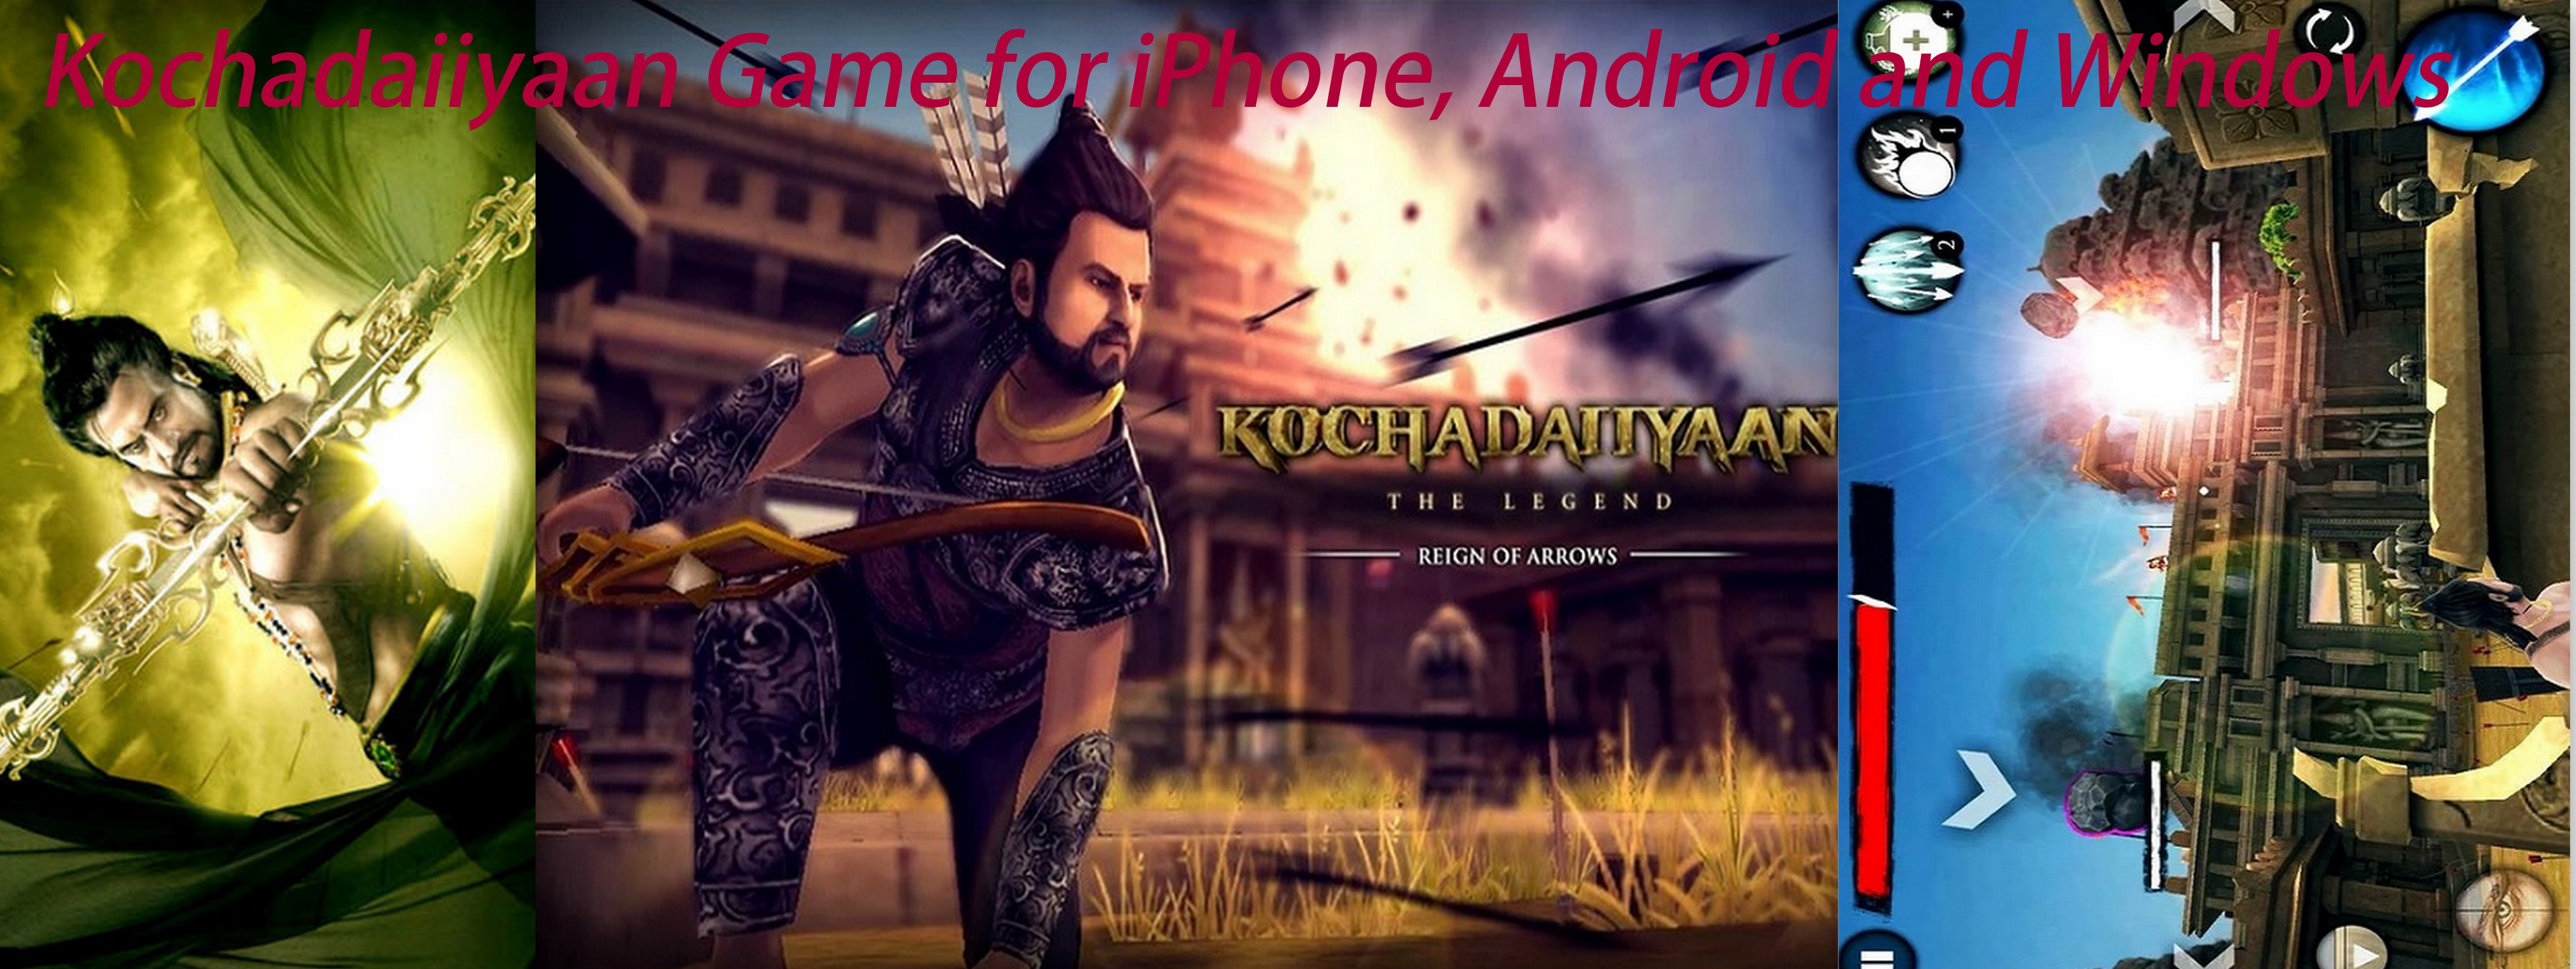 Kochadaiiyan game for iPhone, Android